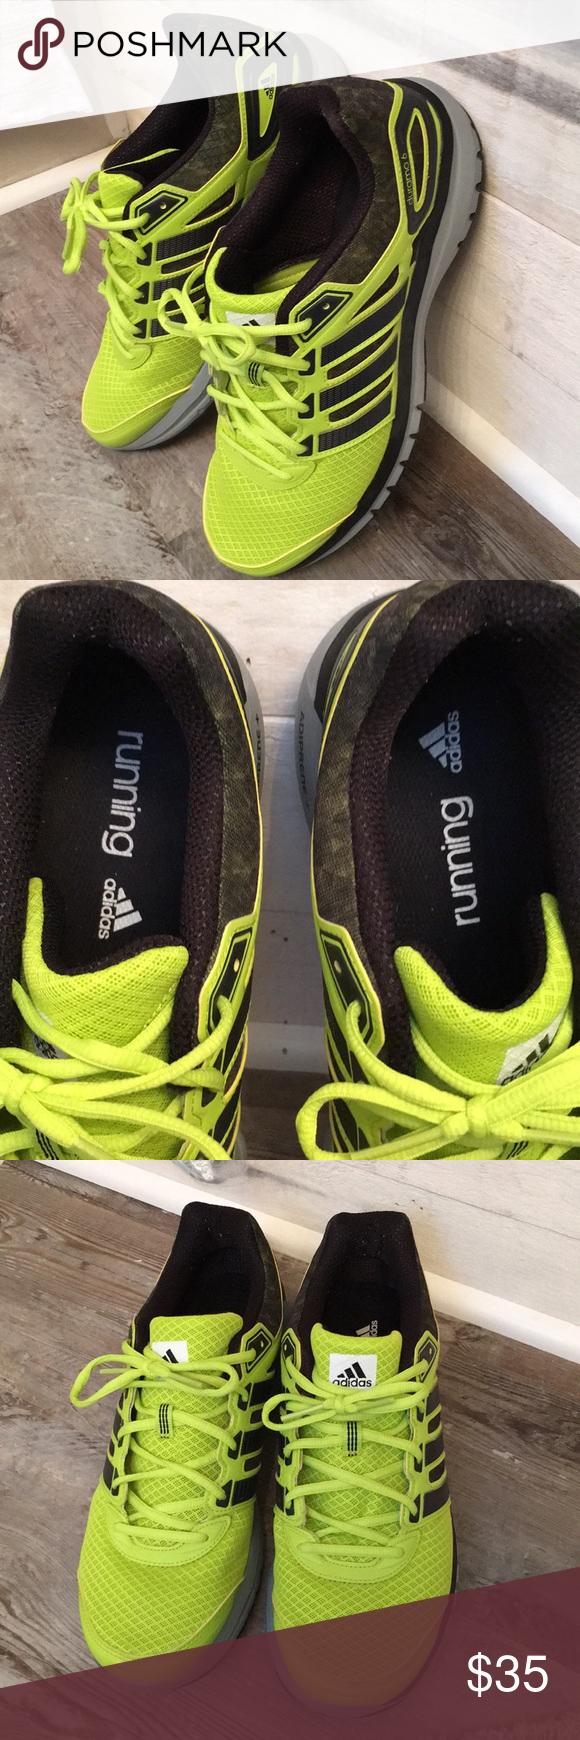 🔵 Men's Adidas Duramo 6 Sneakers